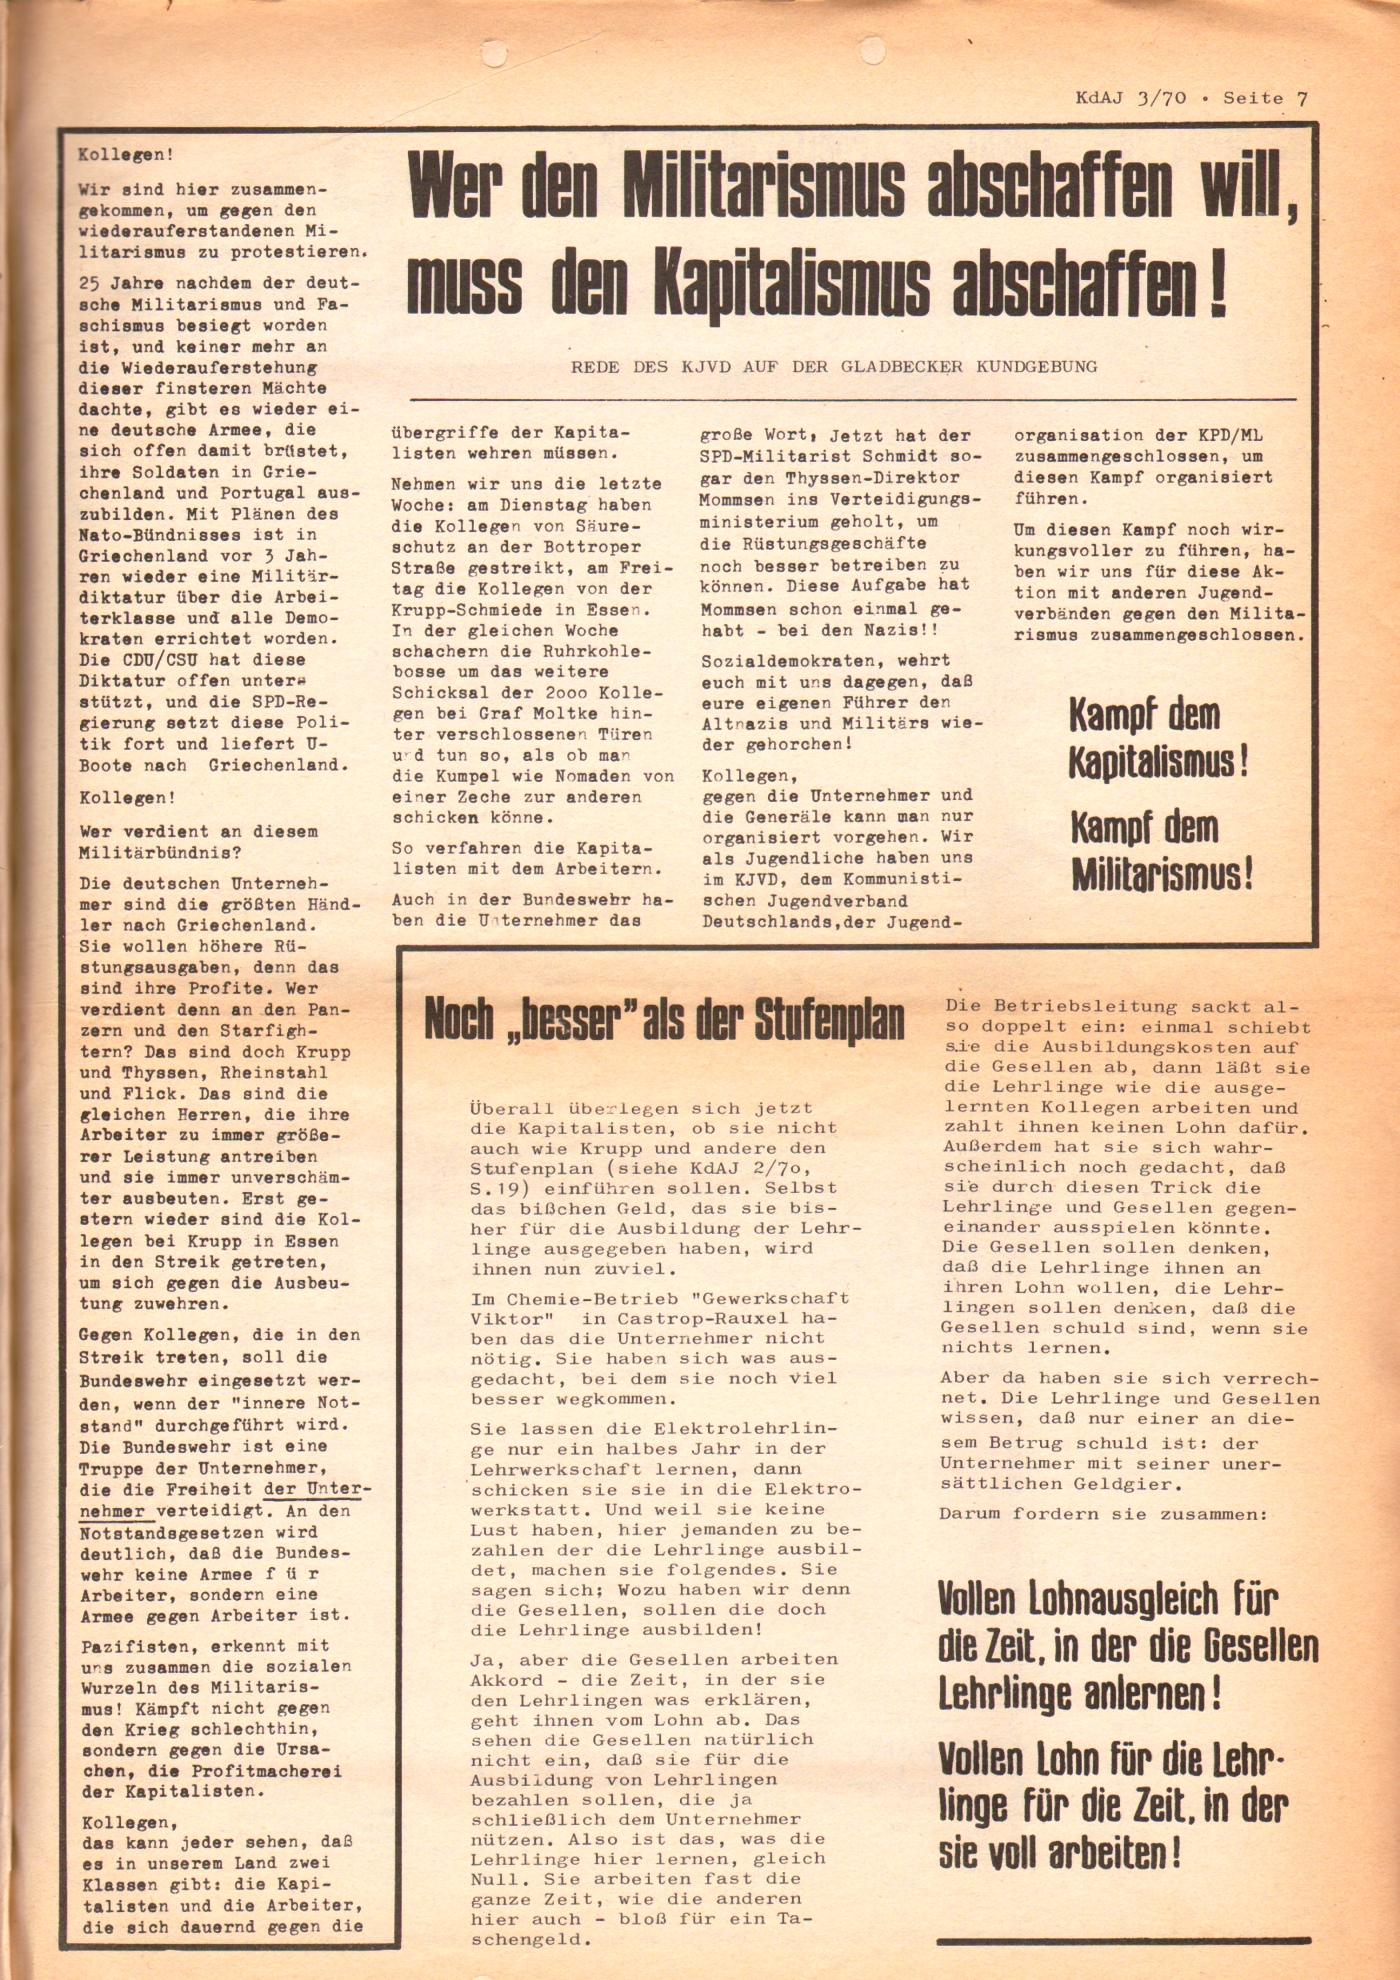 KDAJ, 1. Jg., August 1970, Nr. 3, Seite 7